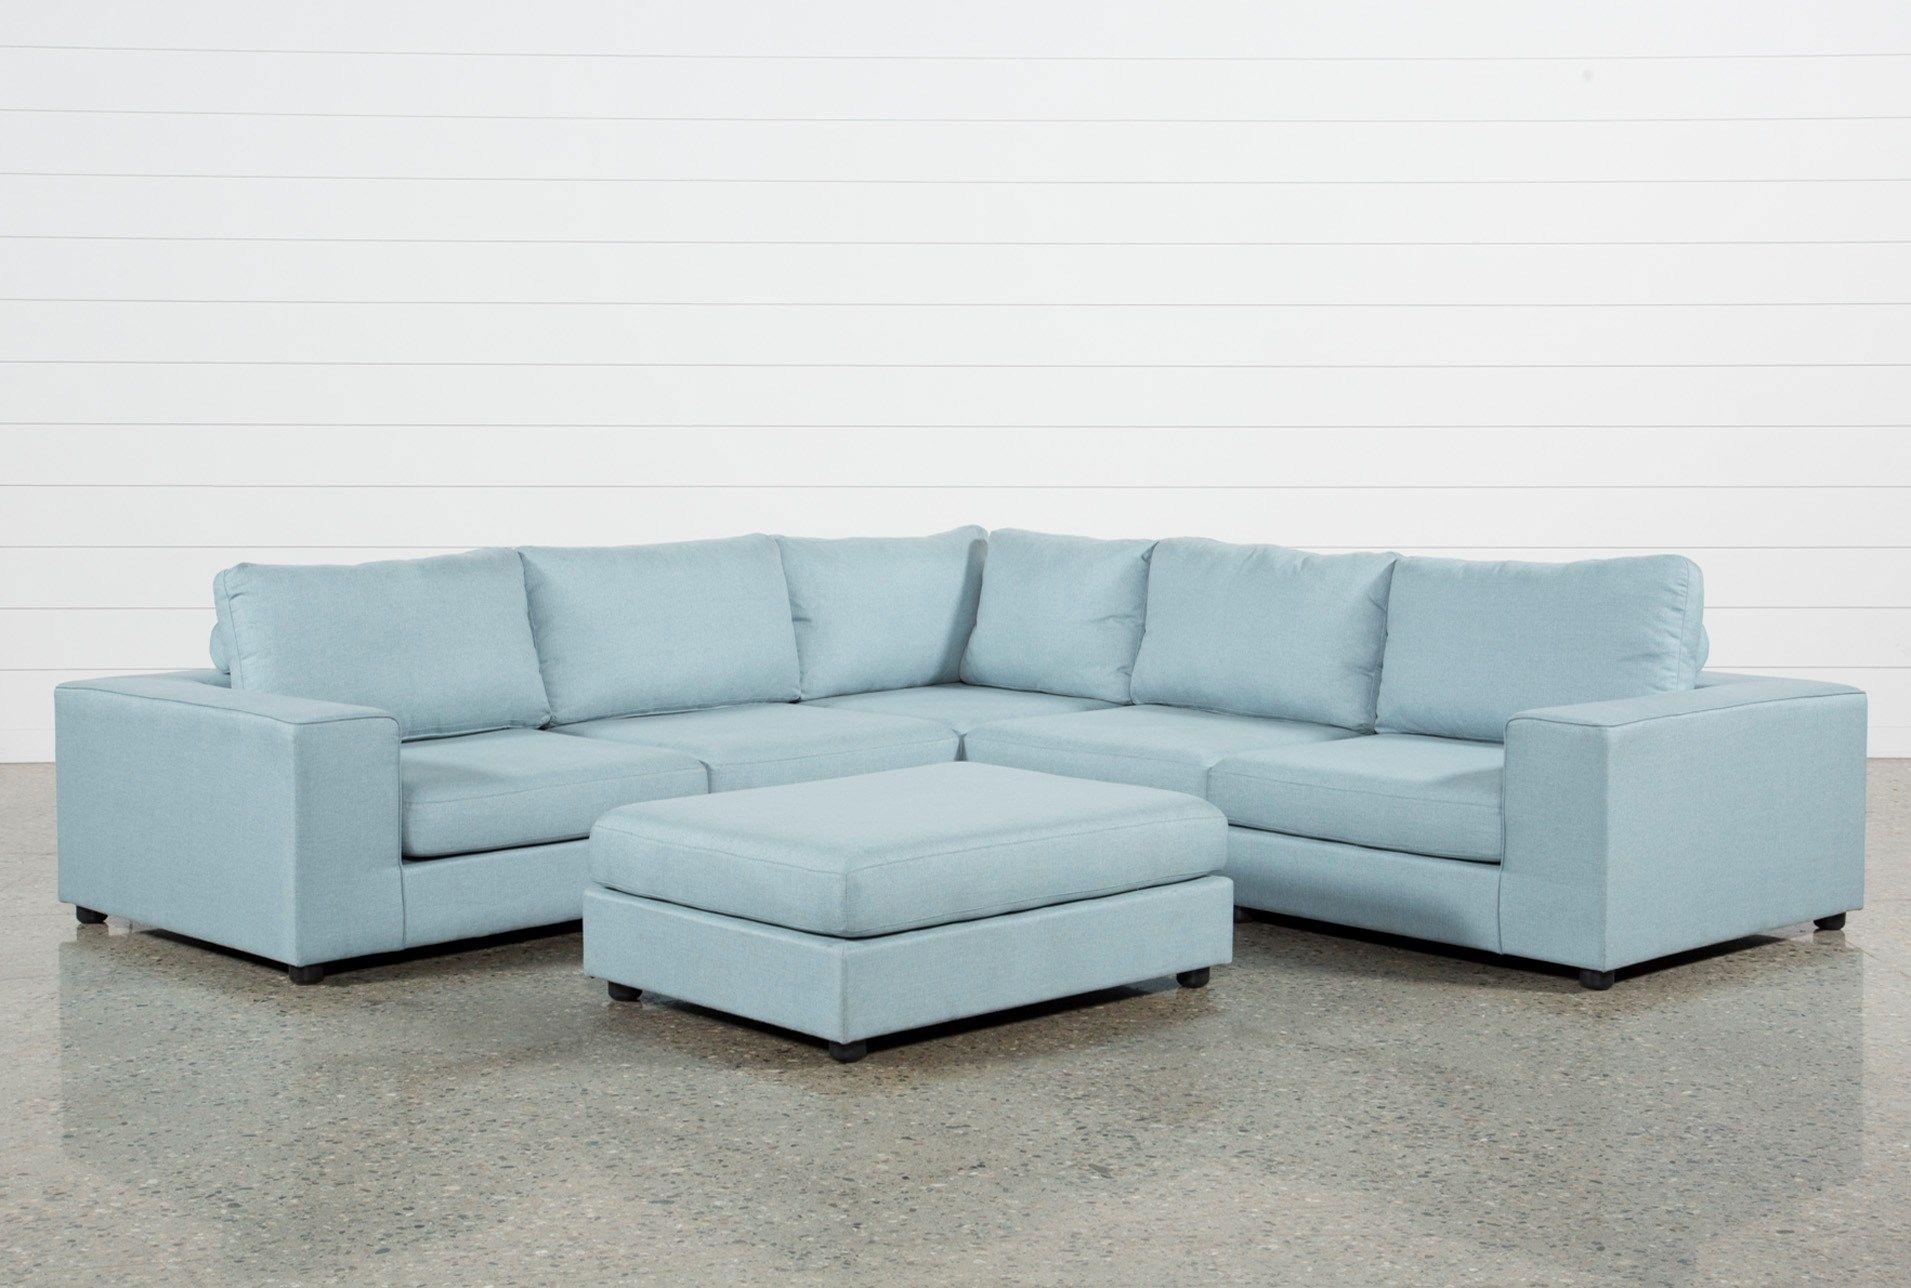 Josephine 2 Piece Sectional W/laf Sofa, Grey | Modular Design Inside Sierra Foam Ii 3 Piece Sectionals (Image 18 of 25)